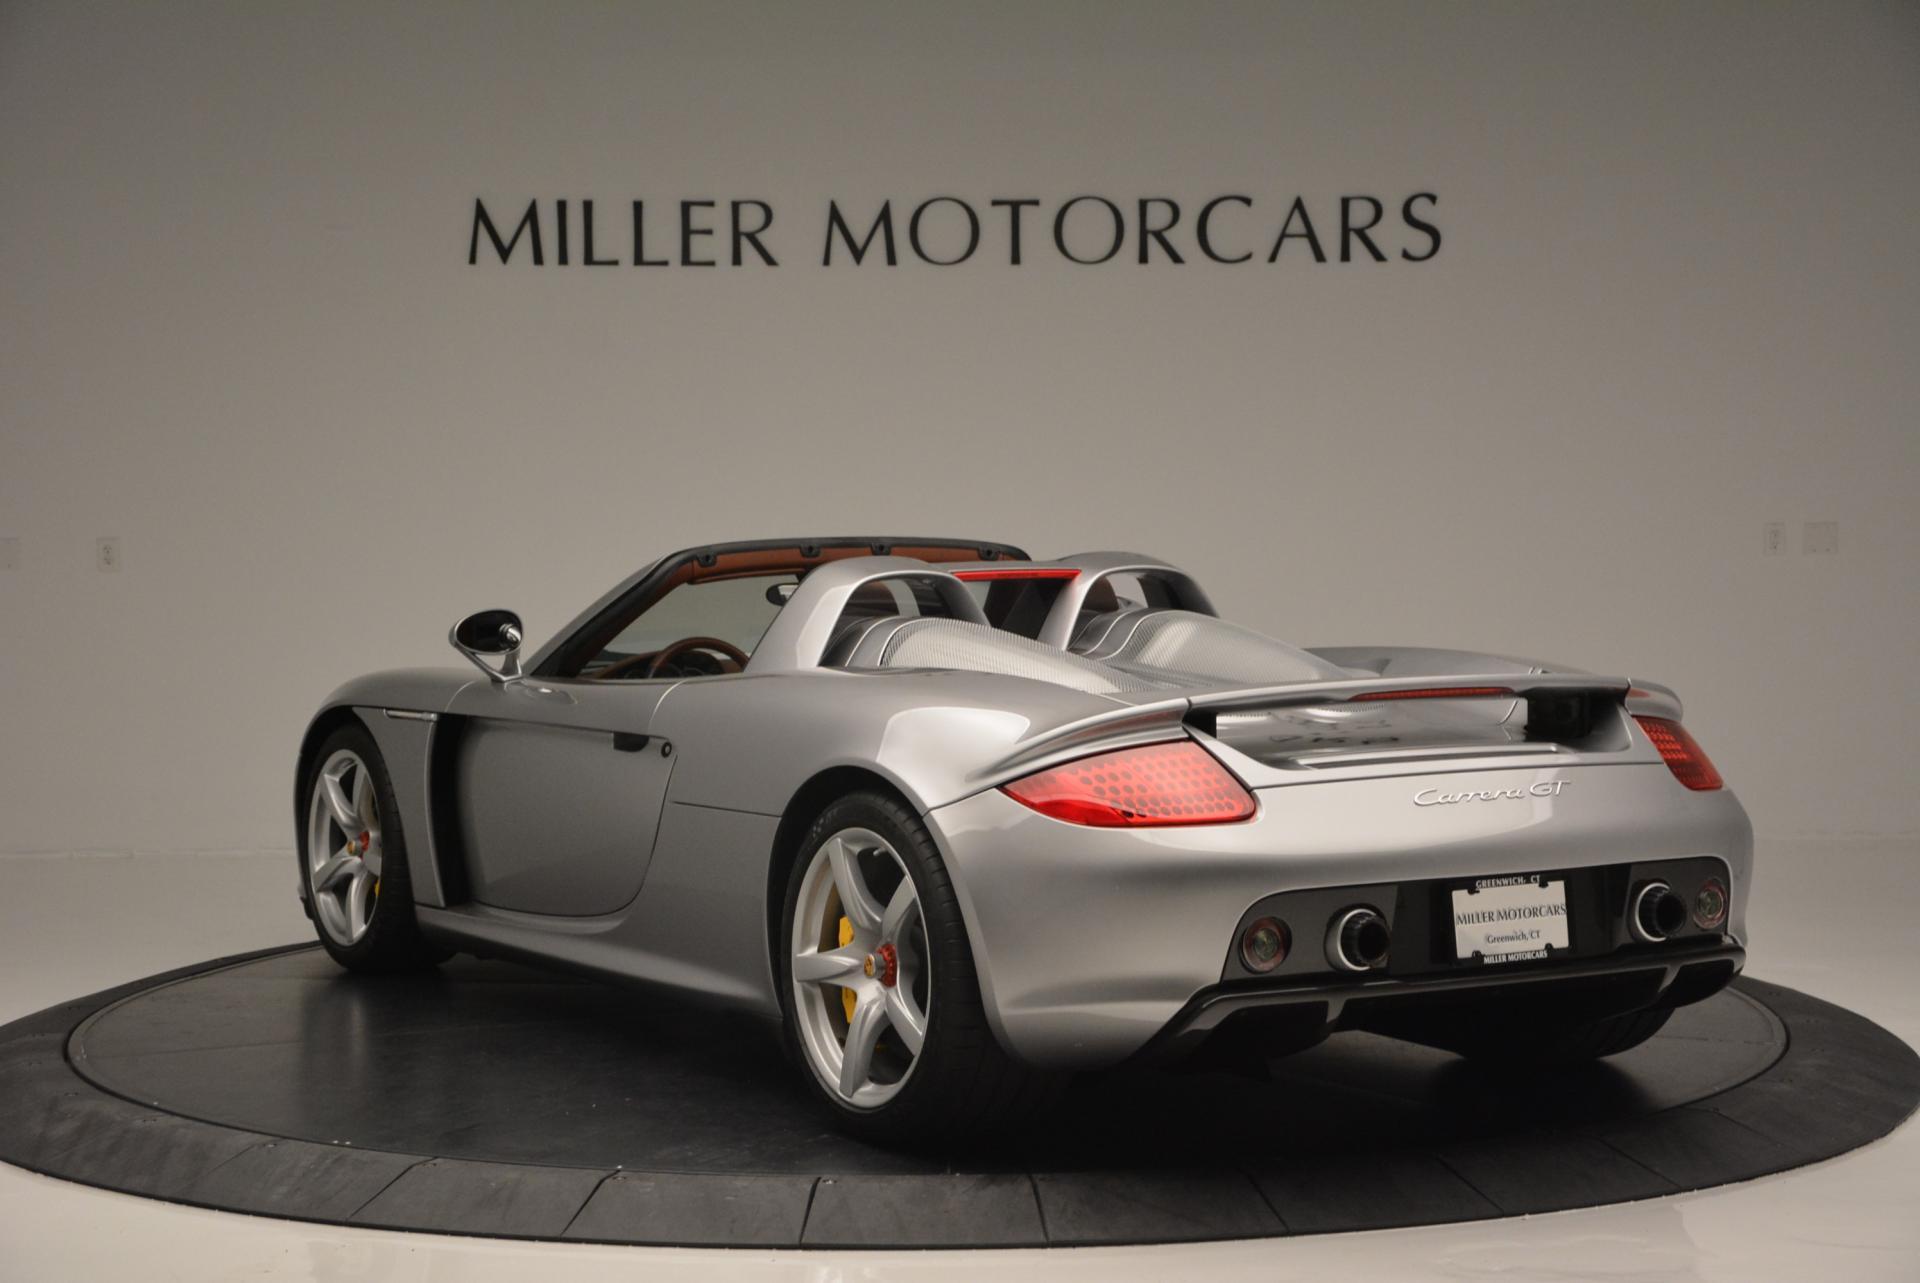 Used 2005 Porsche Carrera GT  For Sale In Greenwich, CT 108_p6